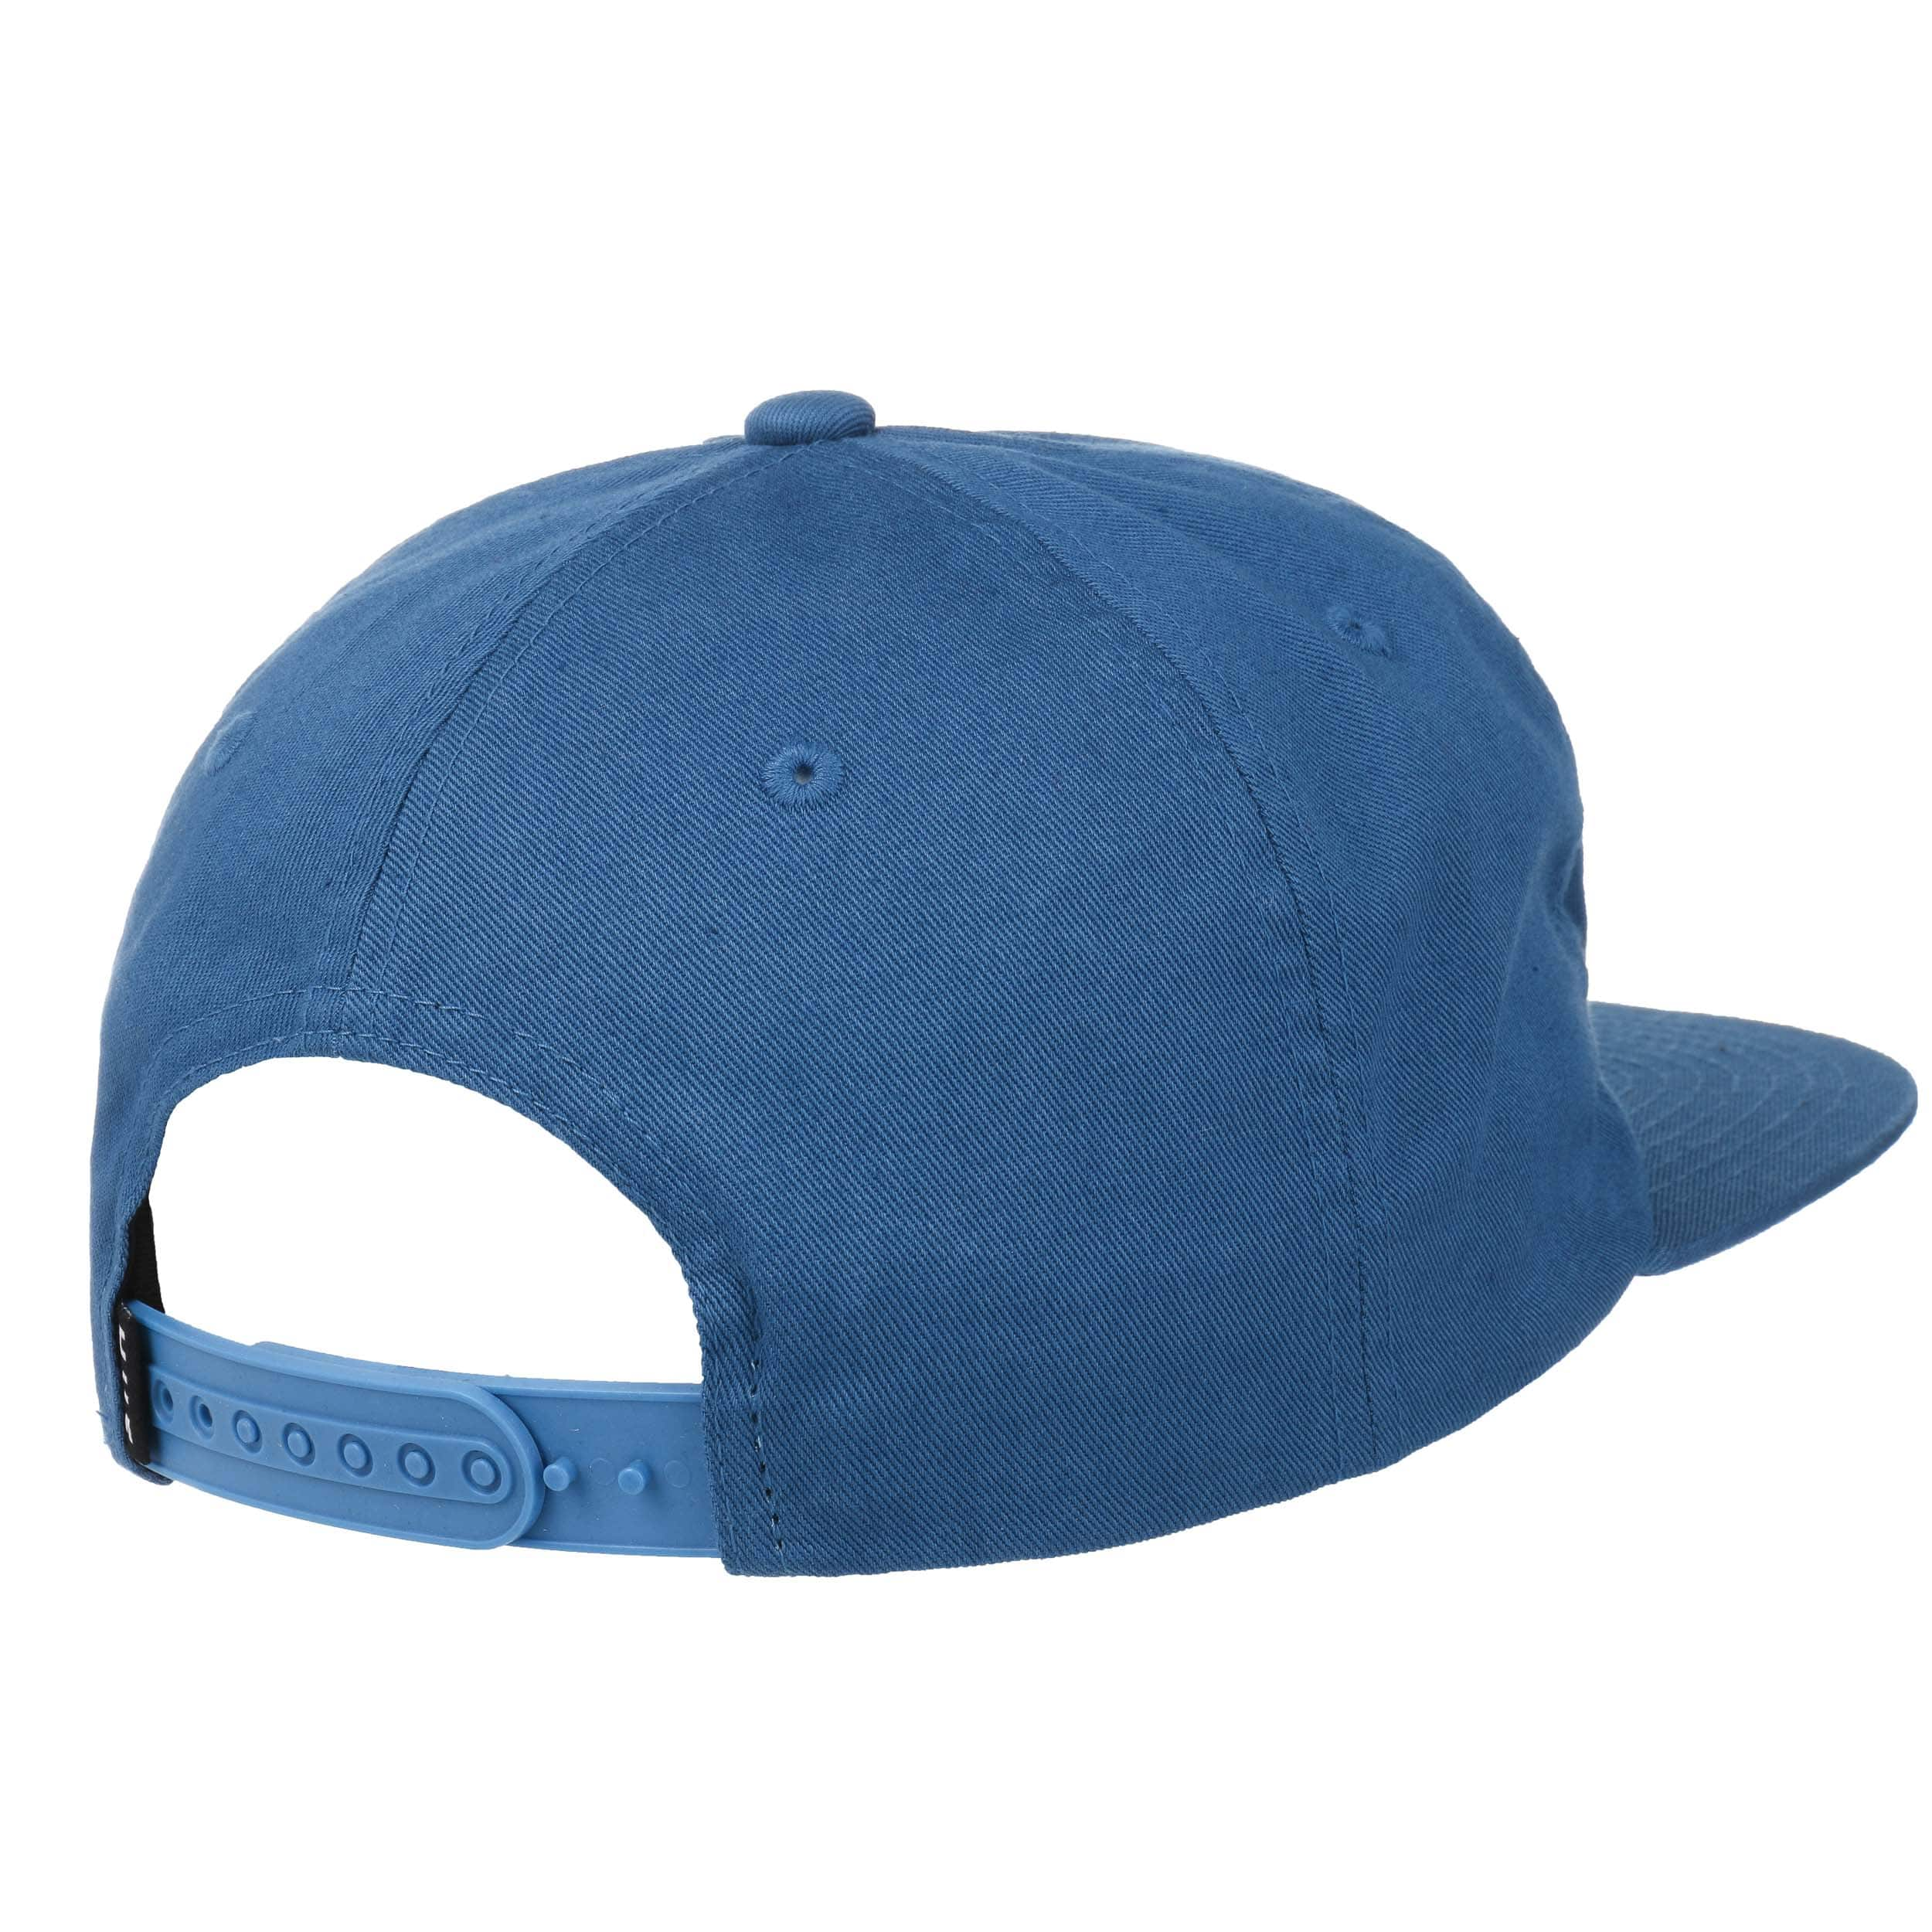 66199e8e78f ... Washed Logo Snapback Cap by HUF - blue 3 ...